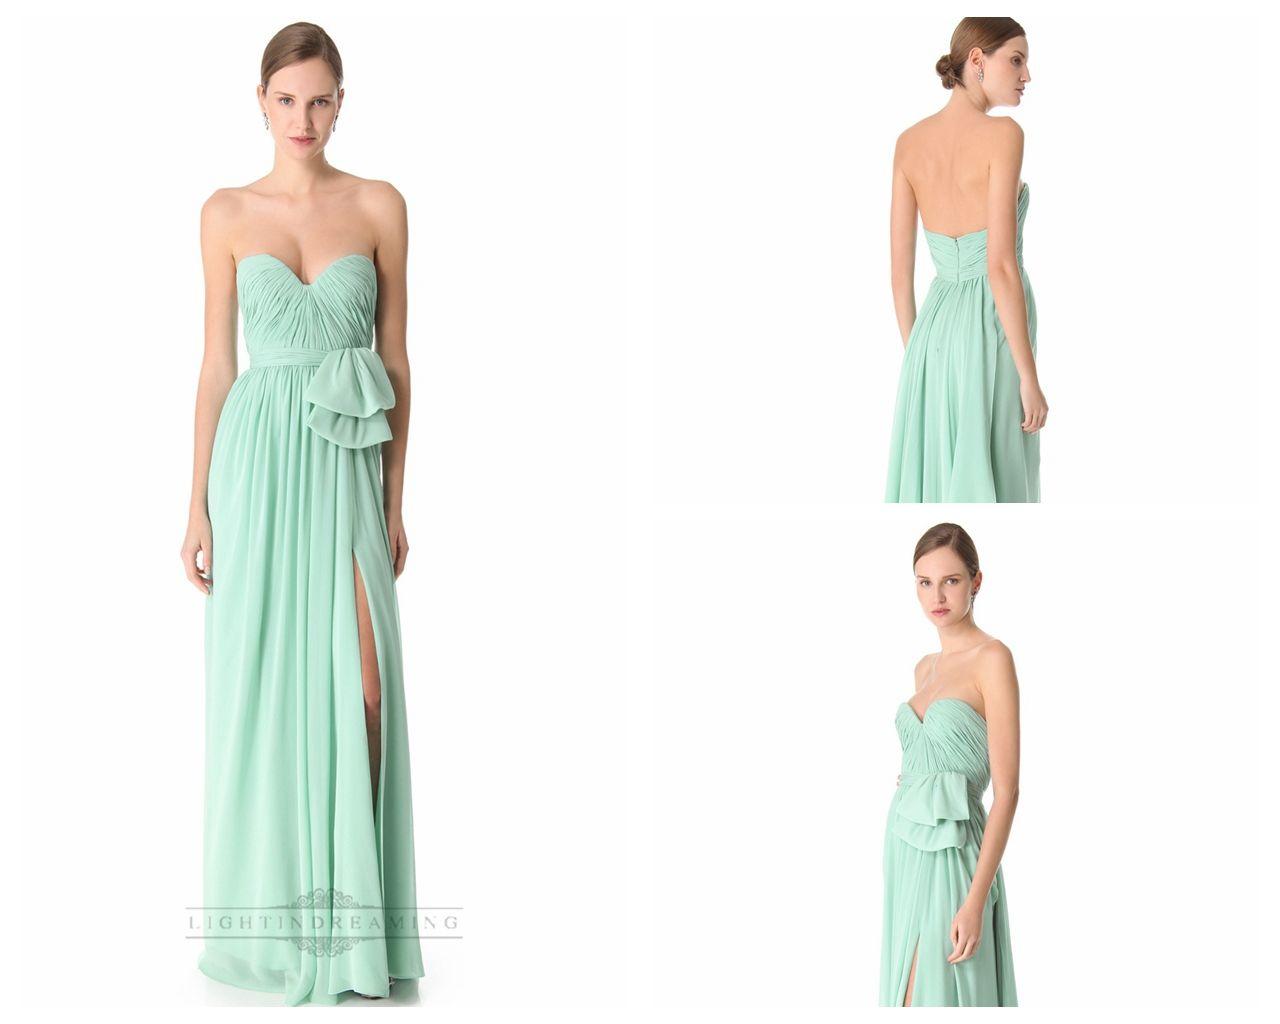 Sweetheart Ruched Bodice Thigh-high Slit Long Prom Dresses / Evening Dresses http://www.ckdress.com/sweetheart-ruched-bodice-thighhigh-slit-long-prom-dresses-evening-dresses-p-450.html  #wedding #dresses #dress #lightindream #lightindreaming #wed #clothing #gown #weddingdresses #dressesonline #dressonline #bride